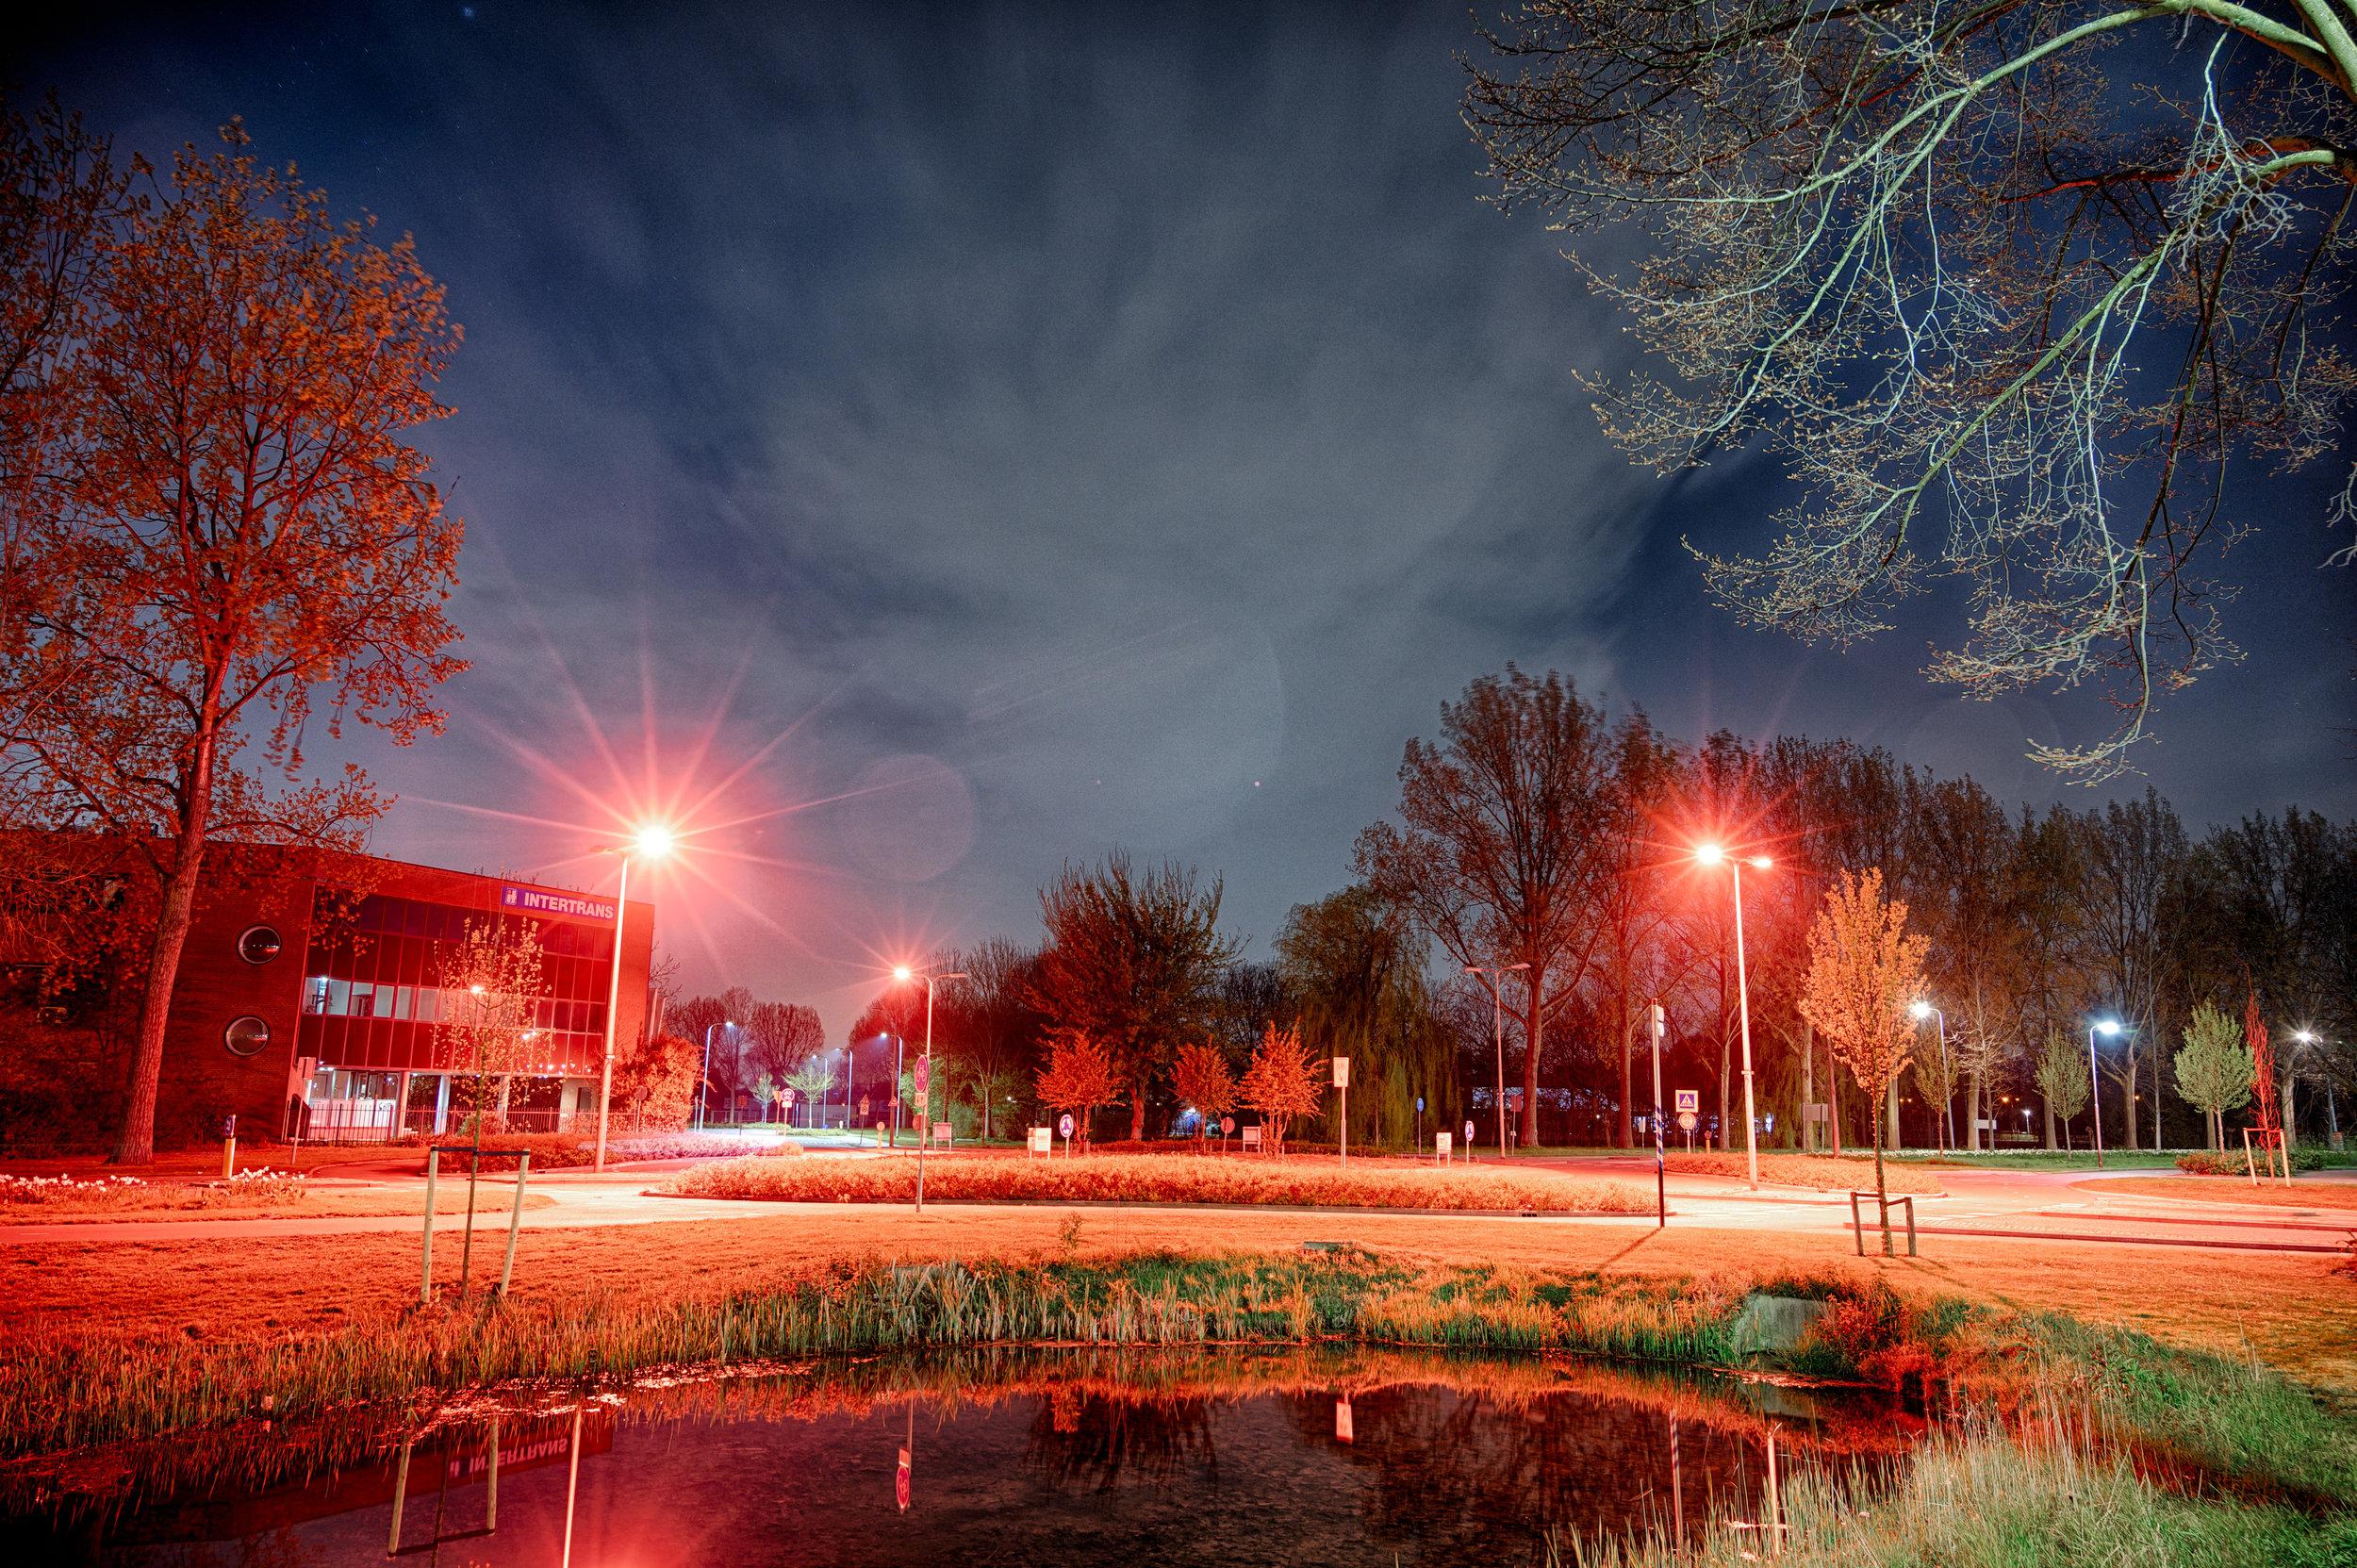 Rotonde bij de Fakkel, Ridderkerk  f/4, 5.00 seconden, ISO 500